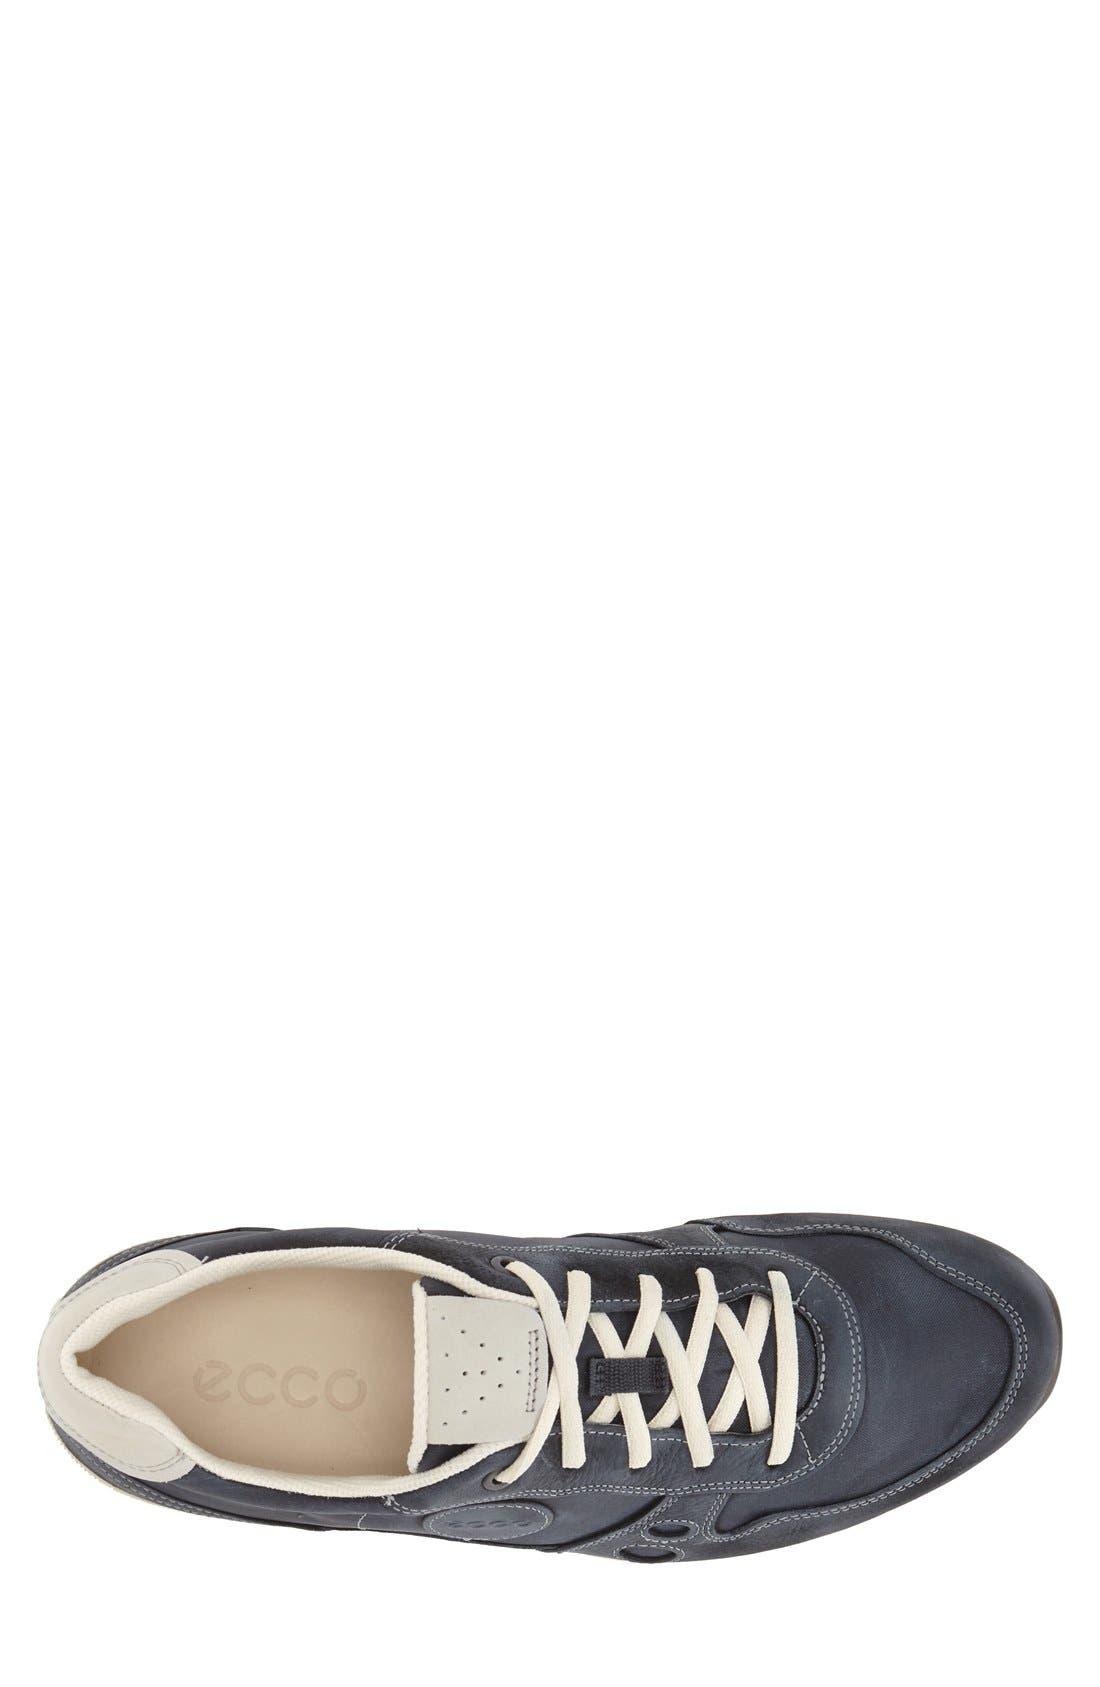 'CS14' Sneaker,                             Alternate thumbnail 4, color,                             015